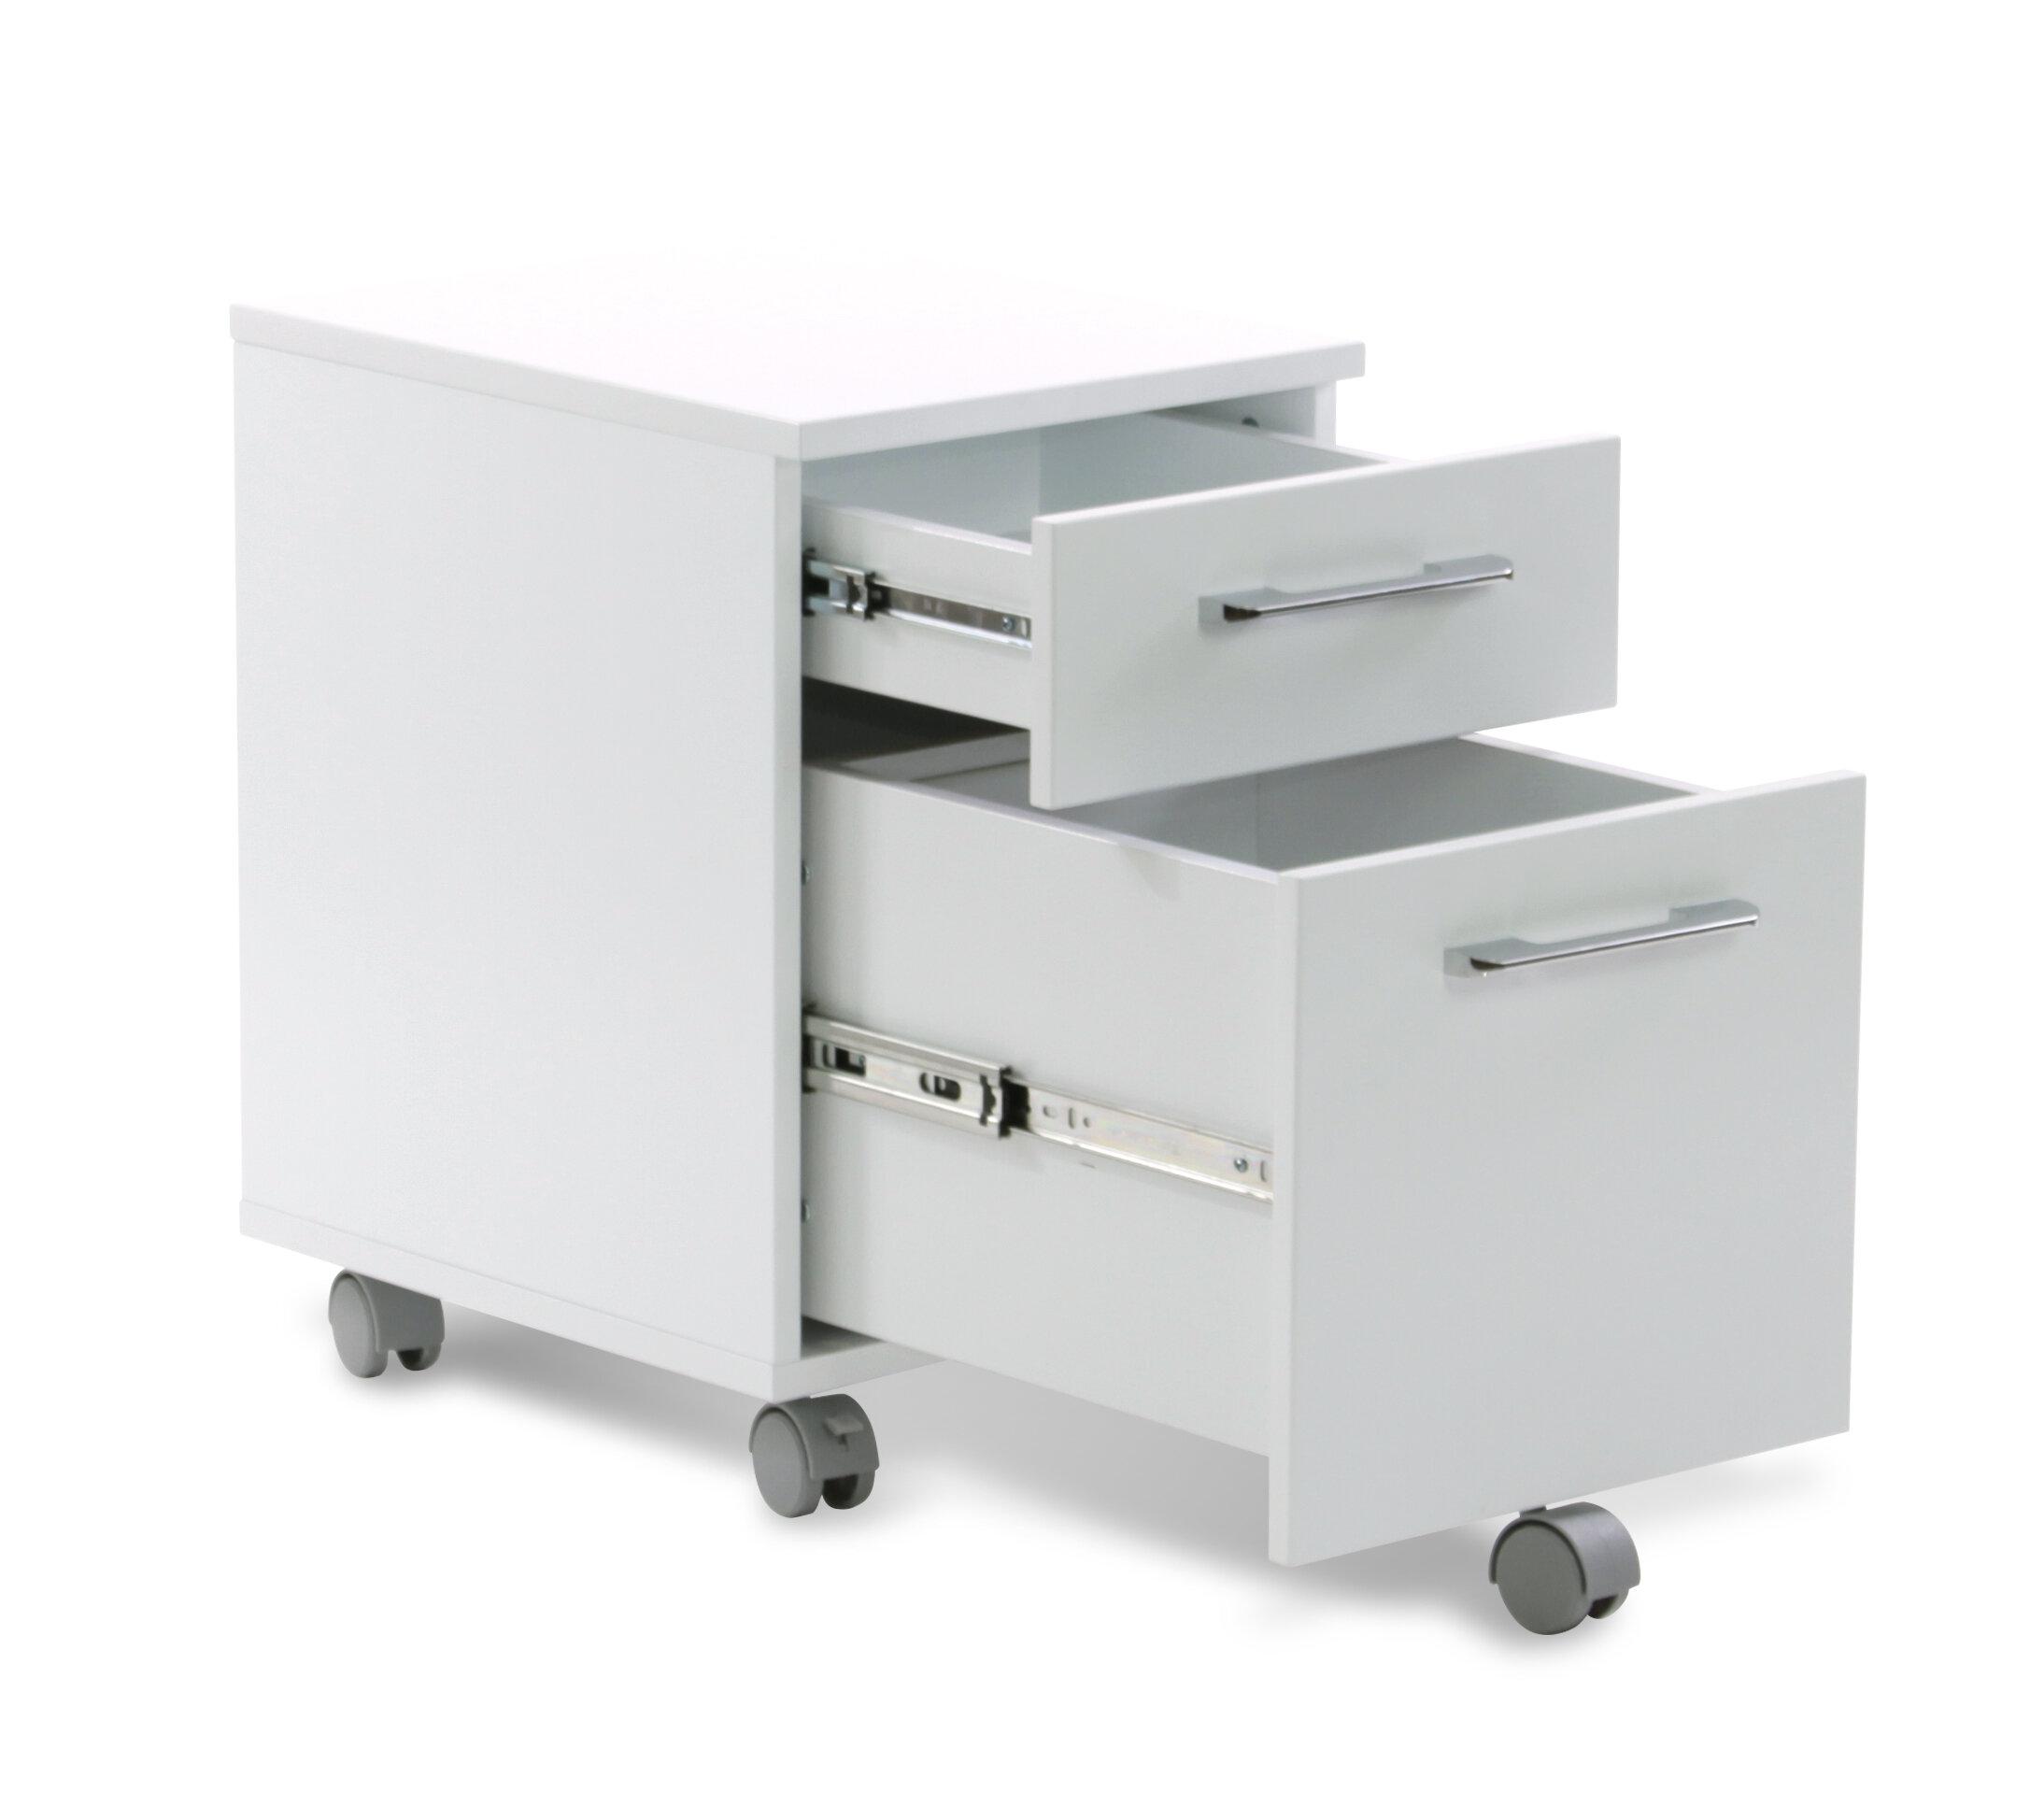 comm office tarbes 2 drawer mobile vertical filing cabinet reviews rh wayfair com 2 drawer metal rolling file cabinet 2 drawer mobile file cabinet black